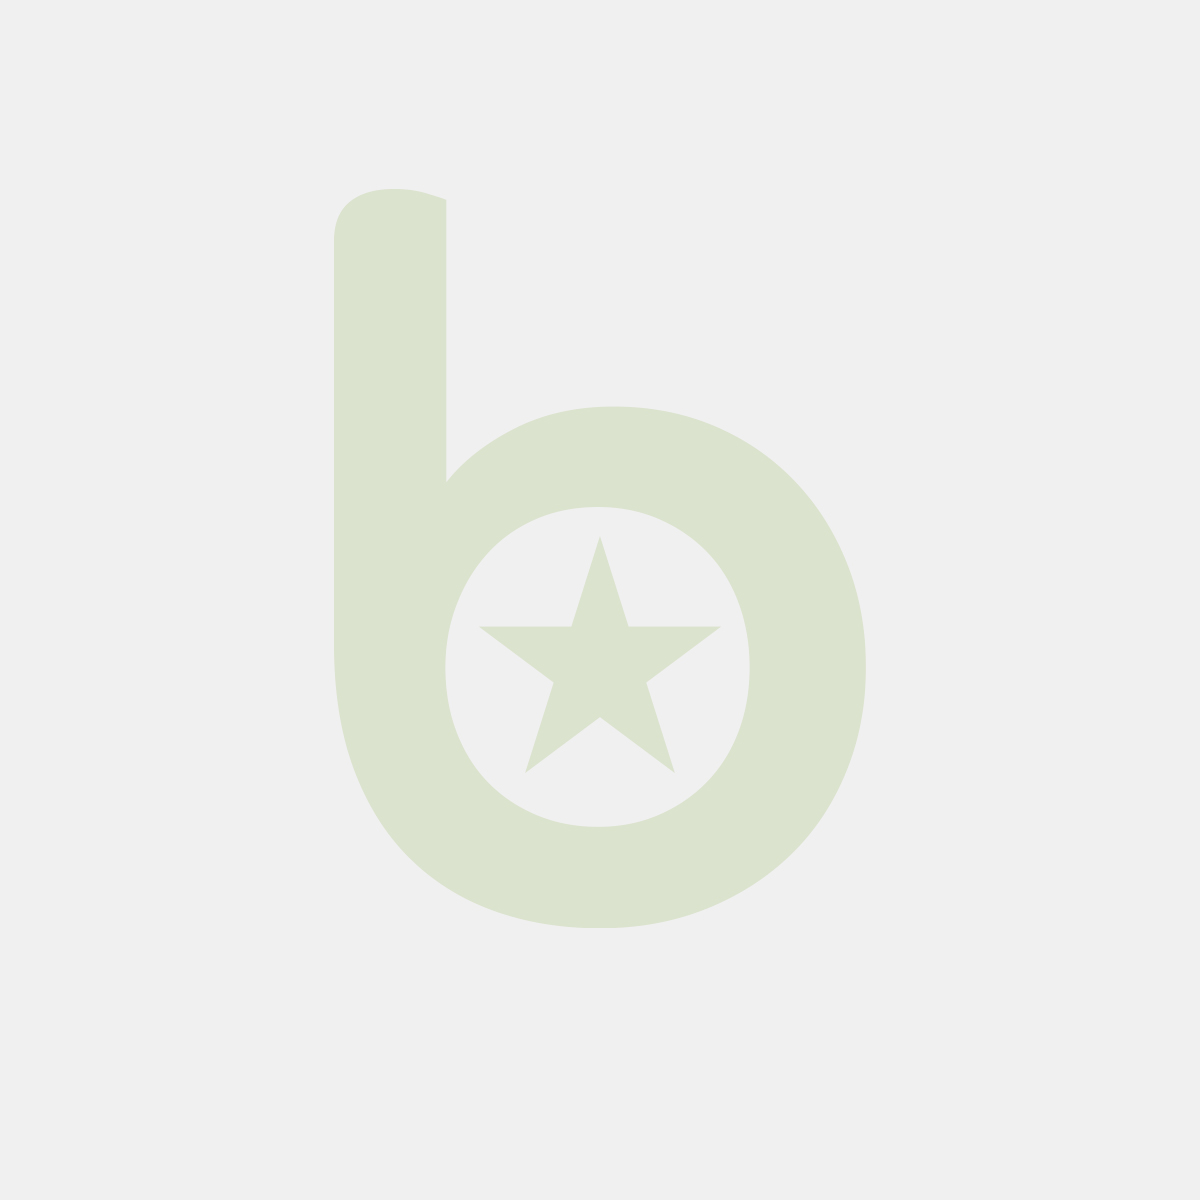 FINGERFOOD - pucharek TULIPAN 70ml czarny PS op. 25 sztuk